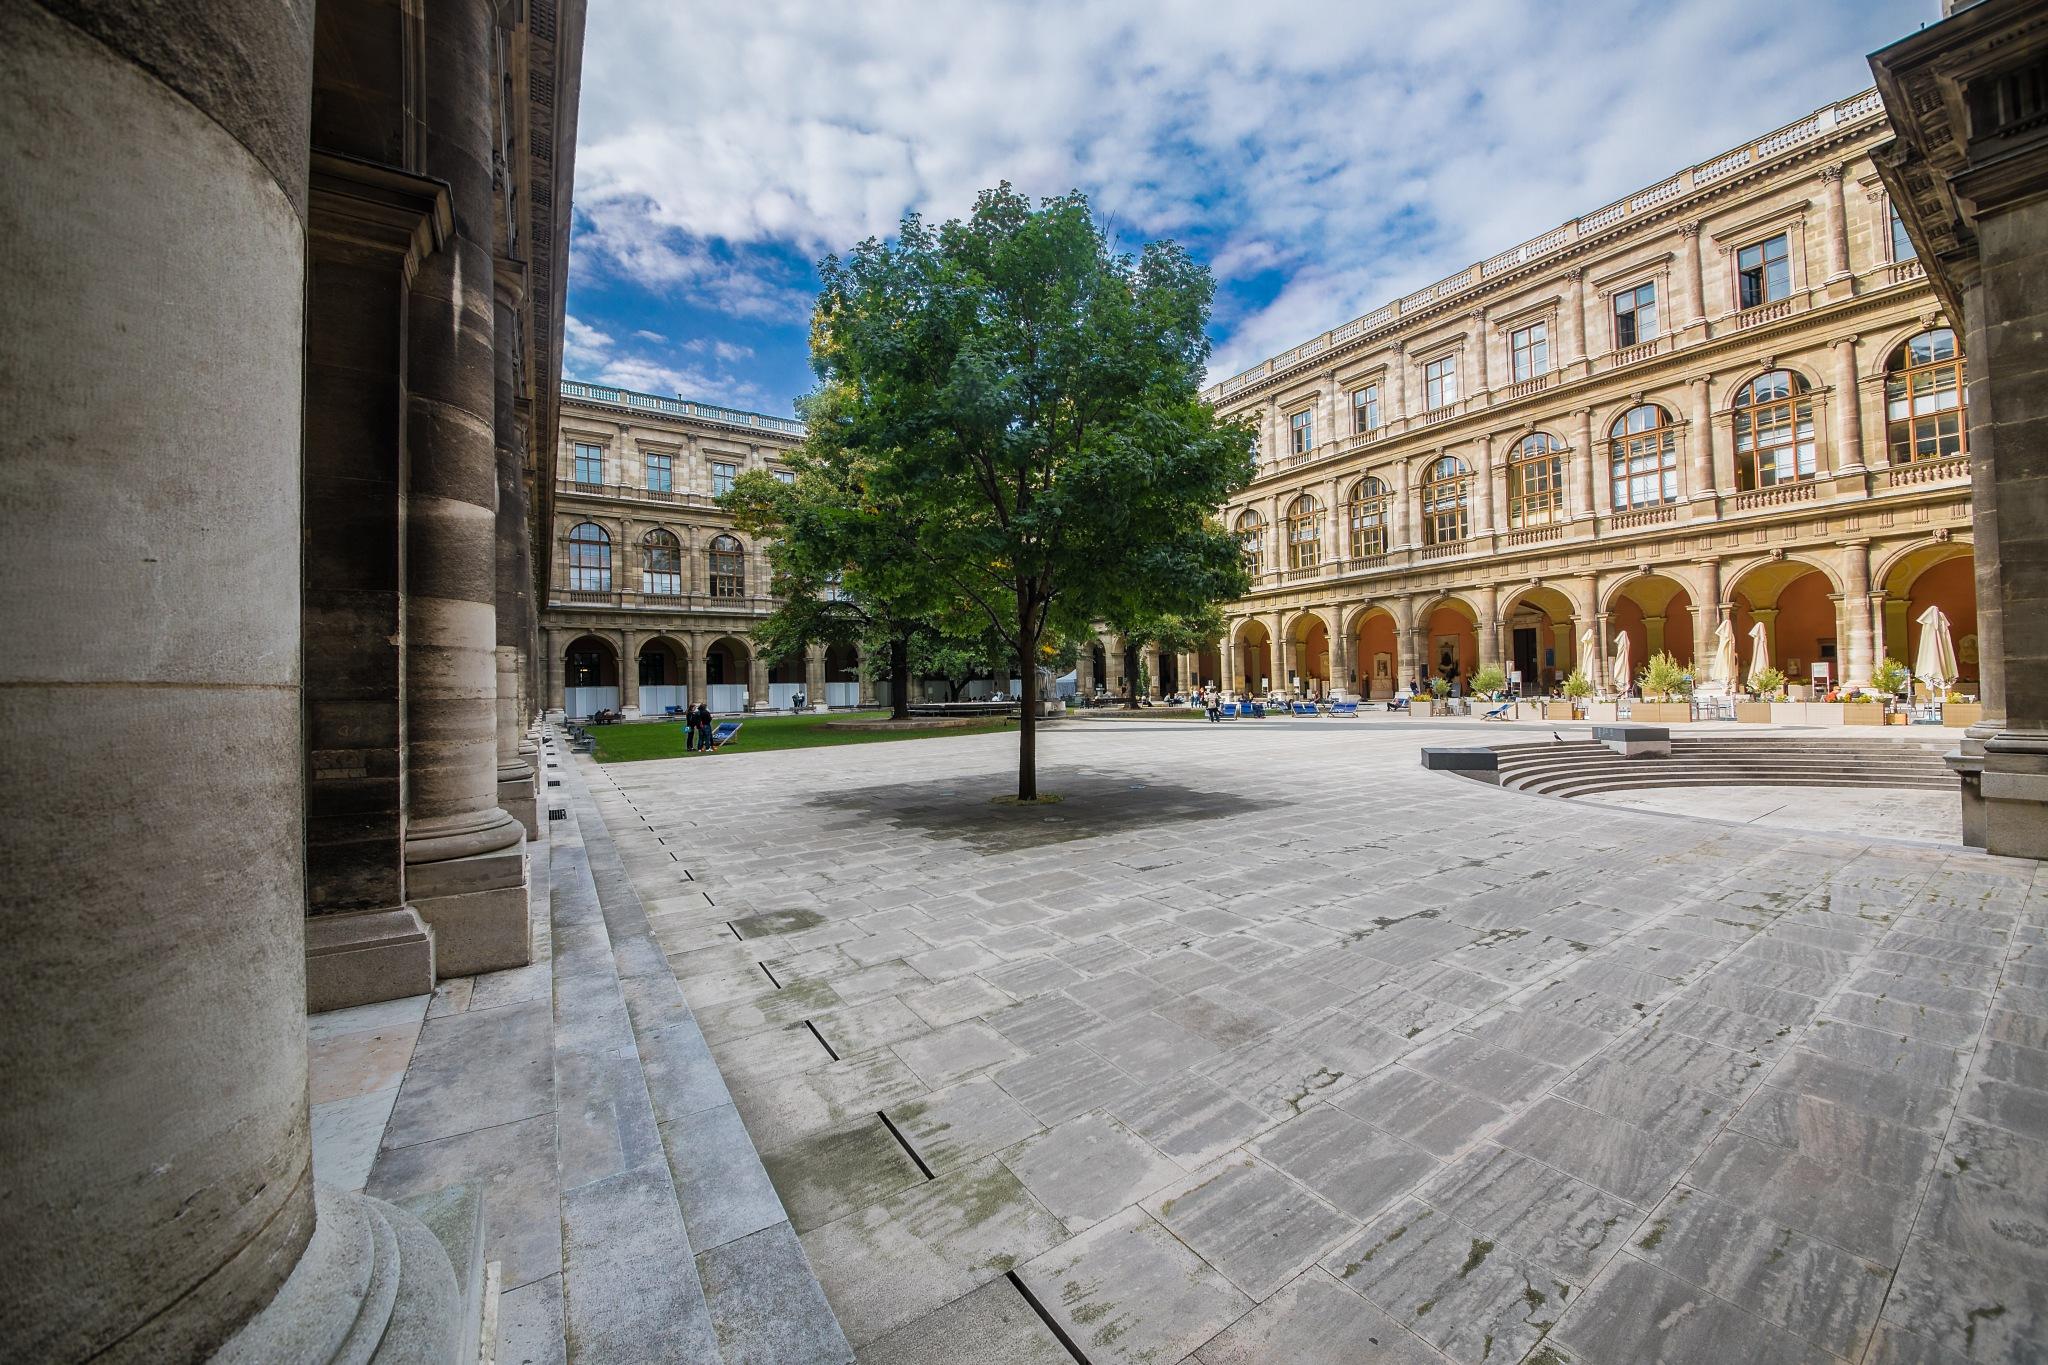 Vienna University by Christoph Reiter